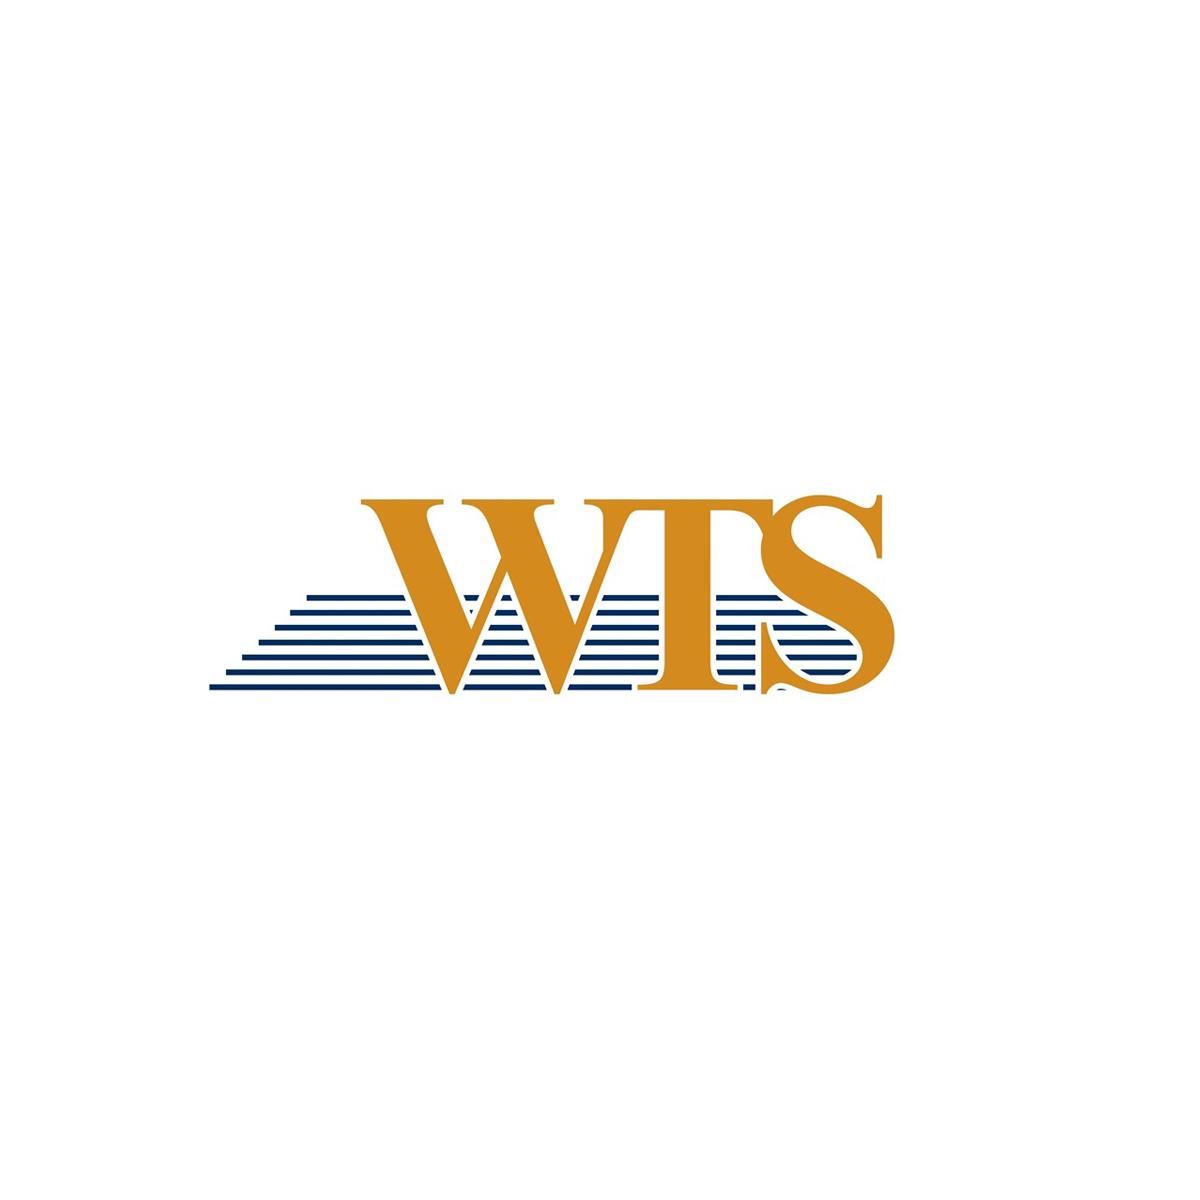 WTS-.jpg